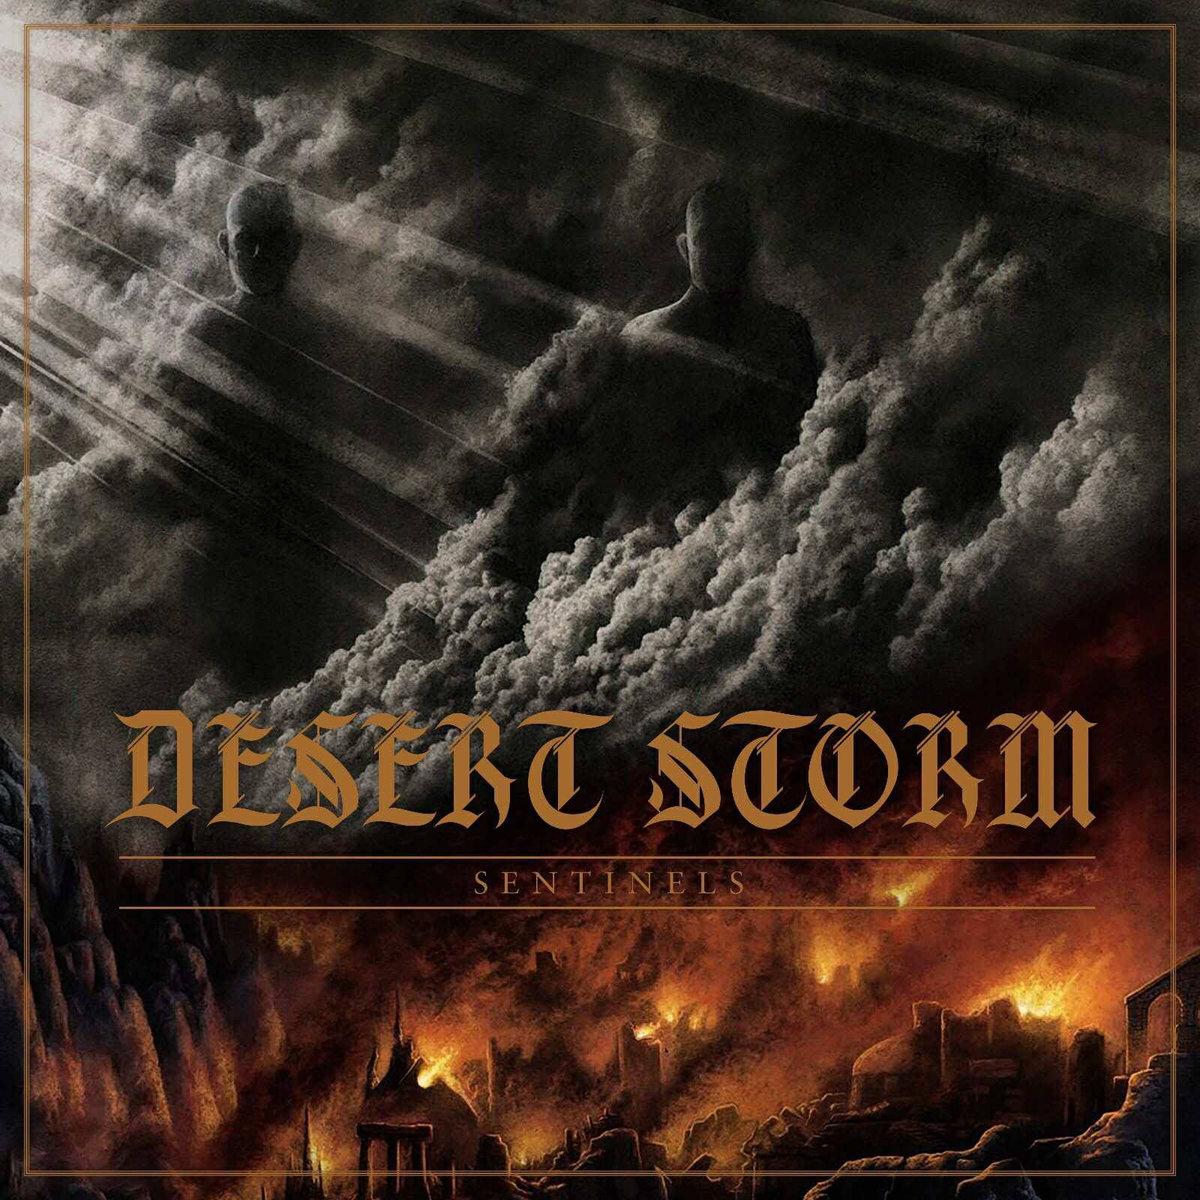 desert storm sentinels